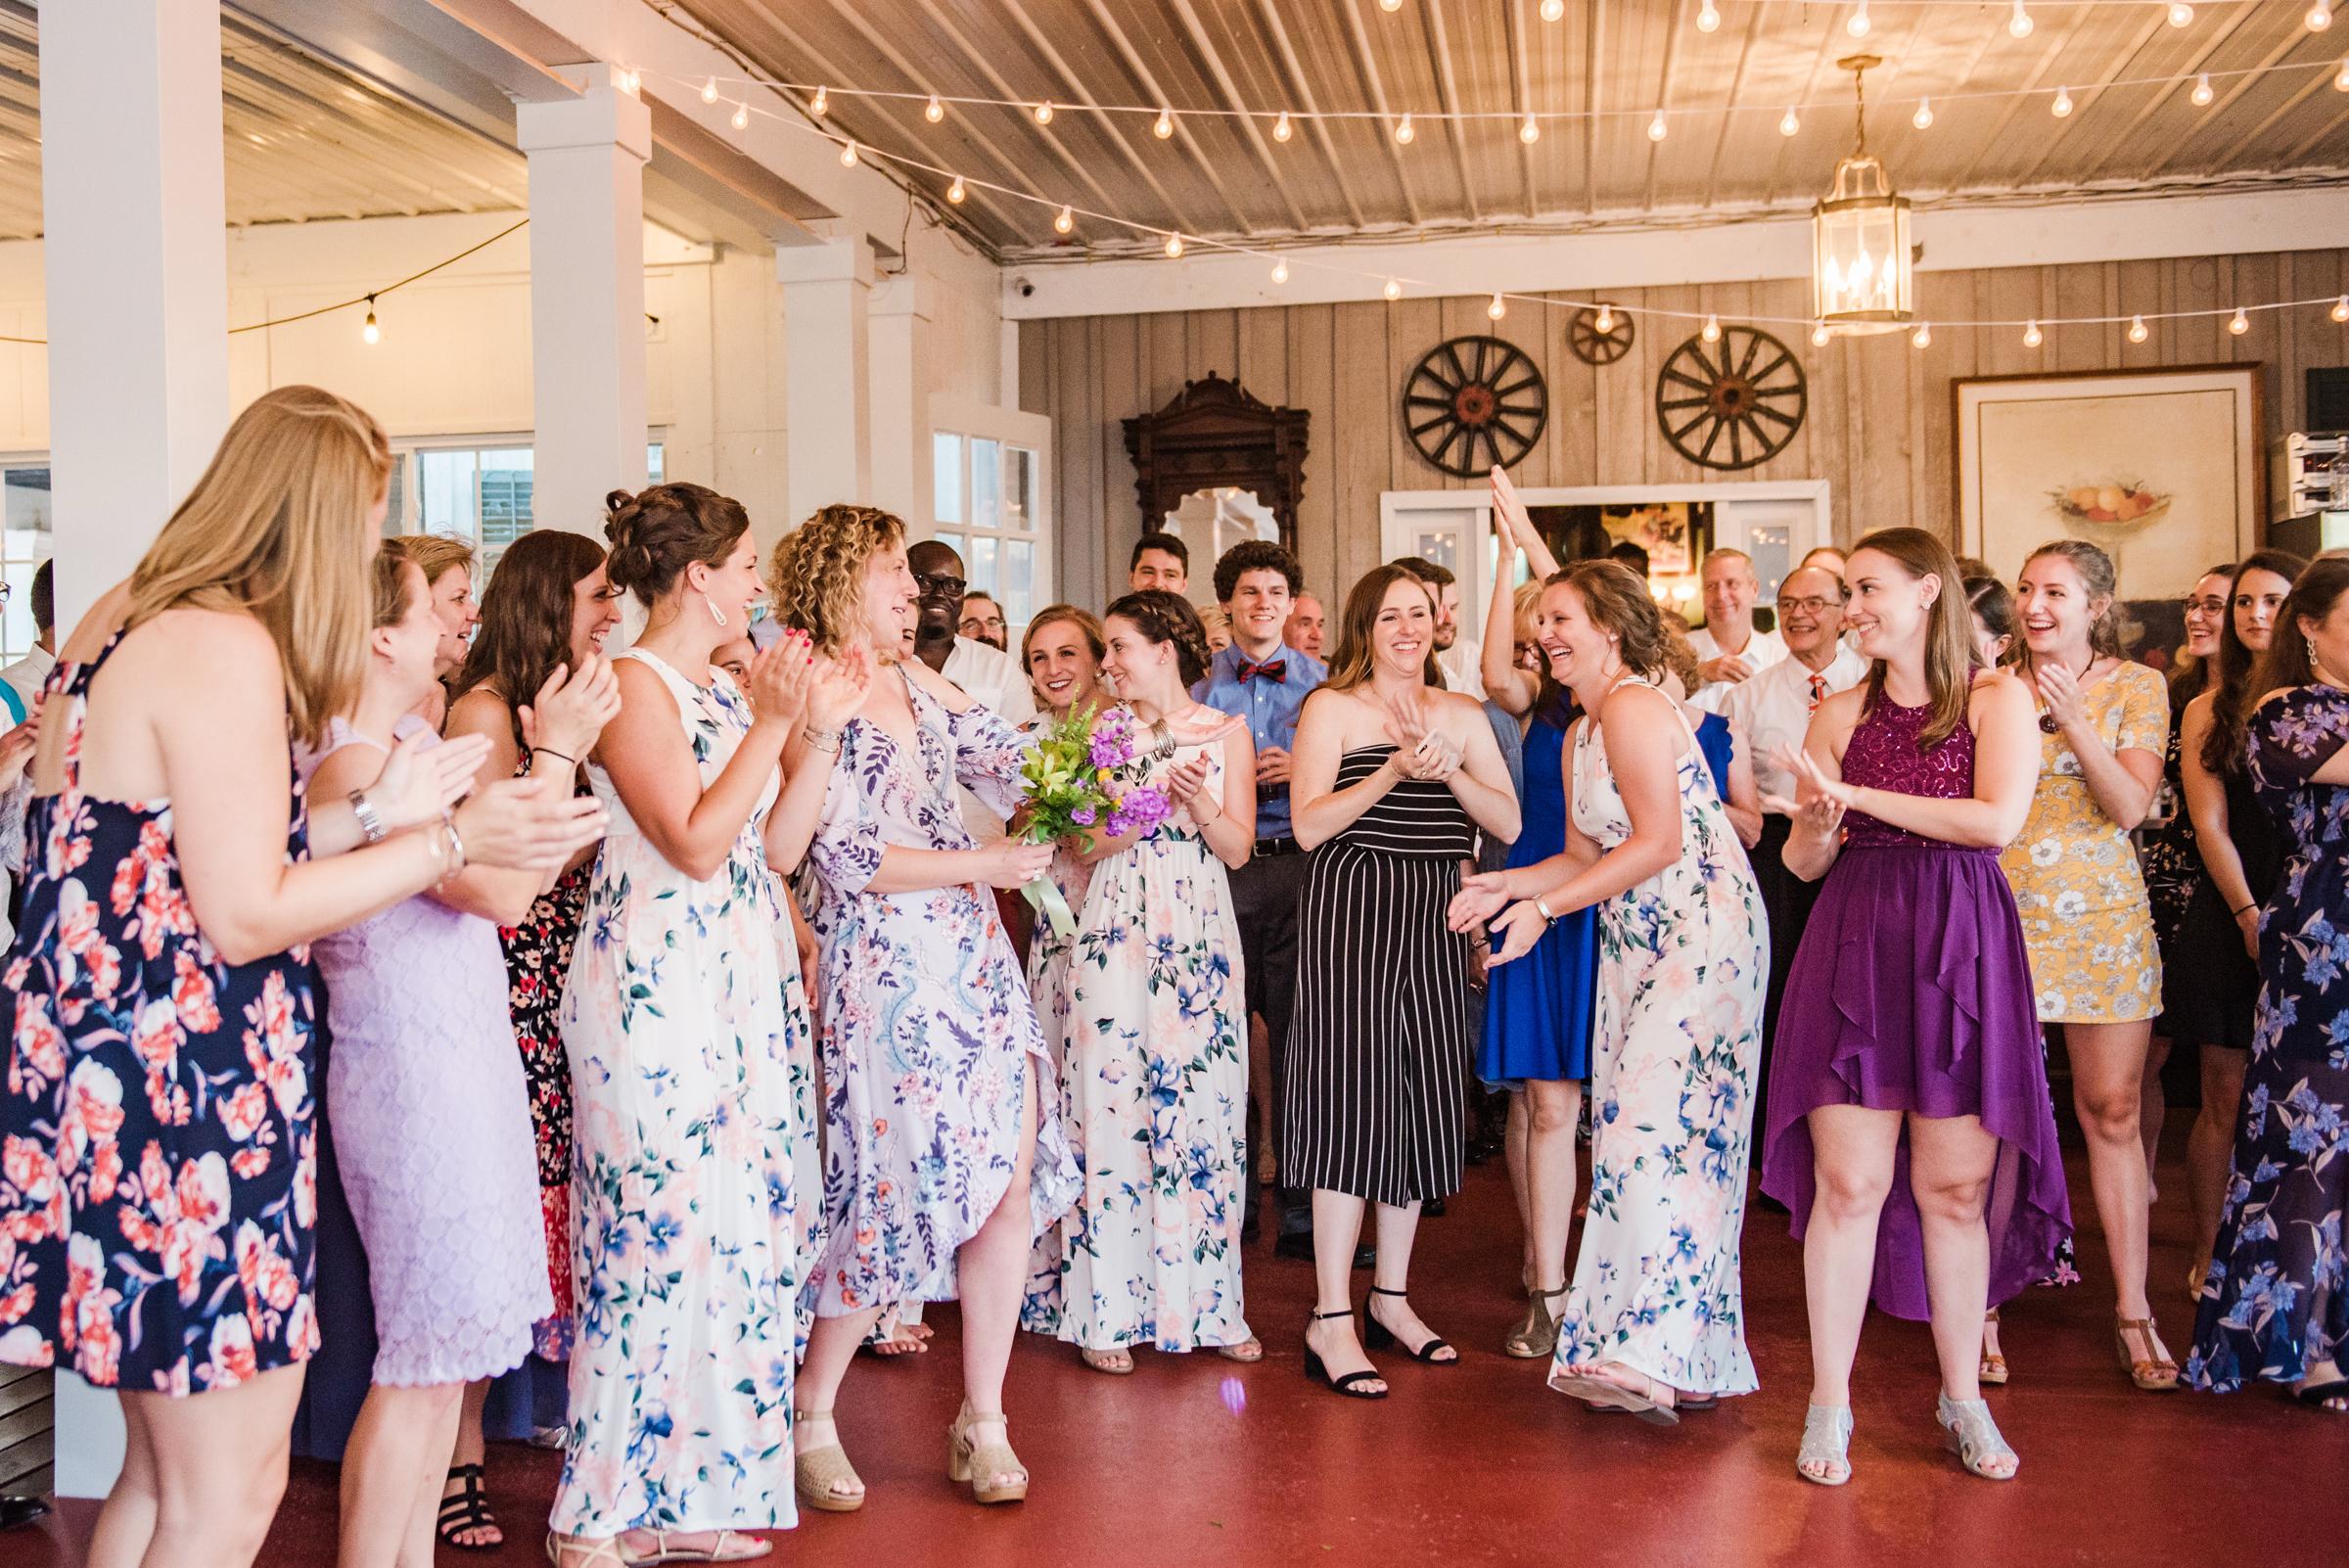 Jerris_Wadsworth_Wedding_Barn_Rochester_Wedding_JILL_STUDIO_Rochester_NY_Photographer_DSC_3061.jpg